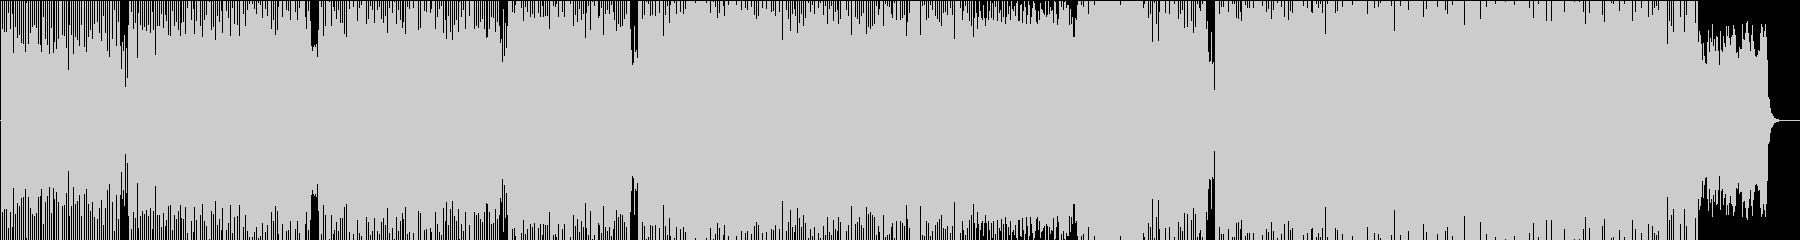 ENDLESS SWIMMER[true]の未再生の波形